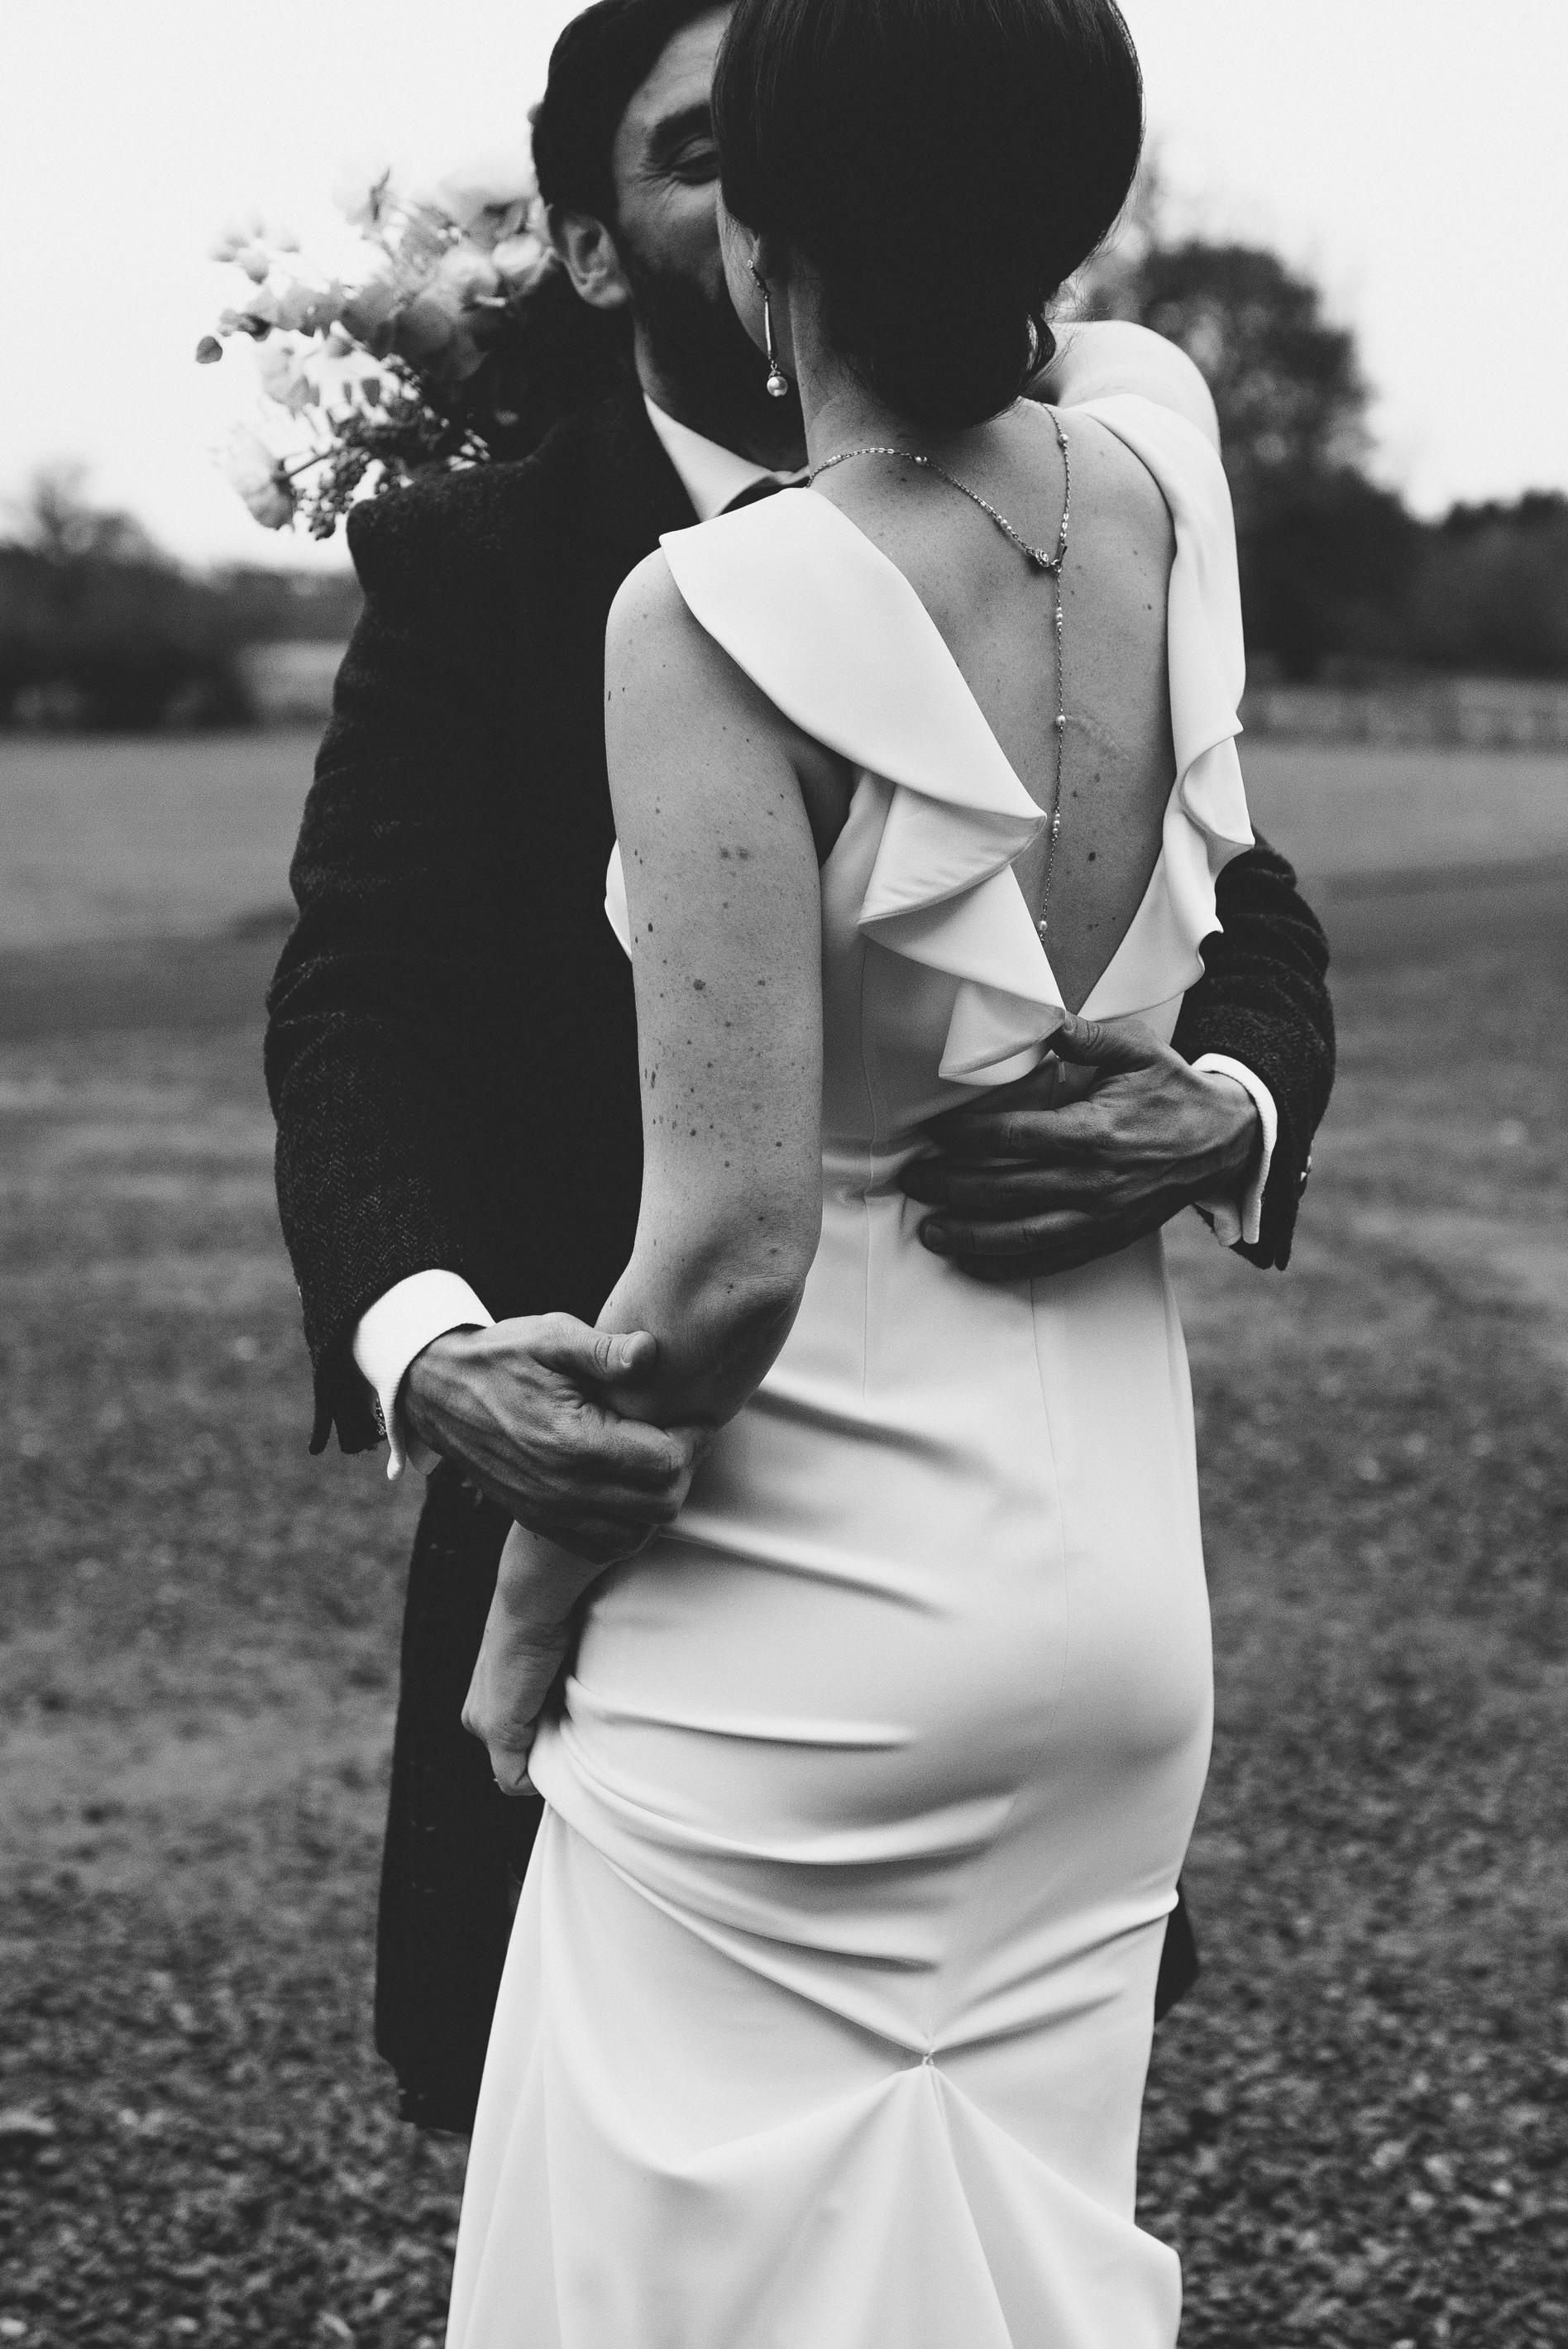 0215-LISA-DEVINE-PHOTOGRAPHY-ALTERNATIVE-WEDDING-PHOTOGRAPHY-SCOTLAND-DESTINATION-WEDDINGS-GLASGOW-WEDDINGS-COOL-WEDDINGS-STYLISH-WEDDINGS.JPG